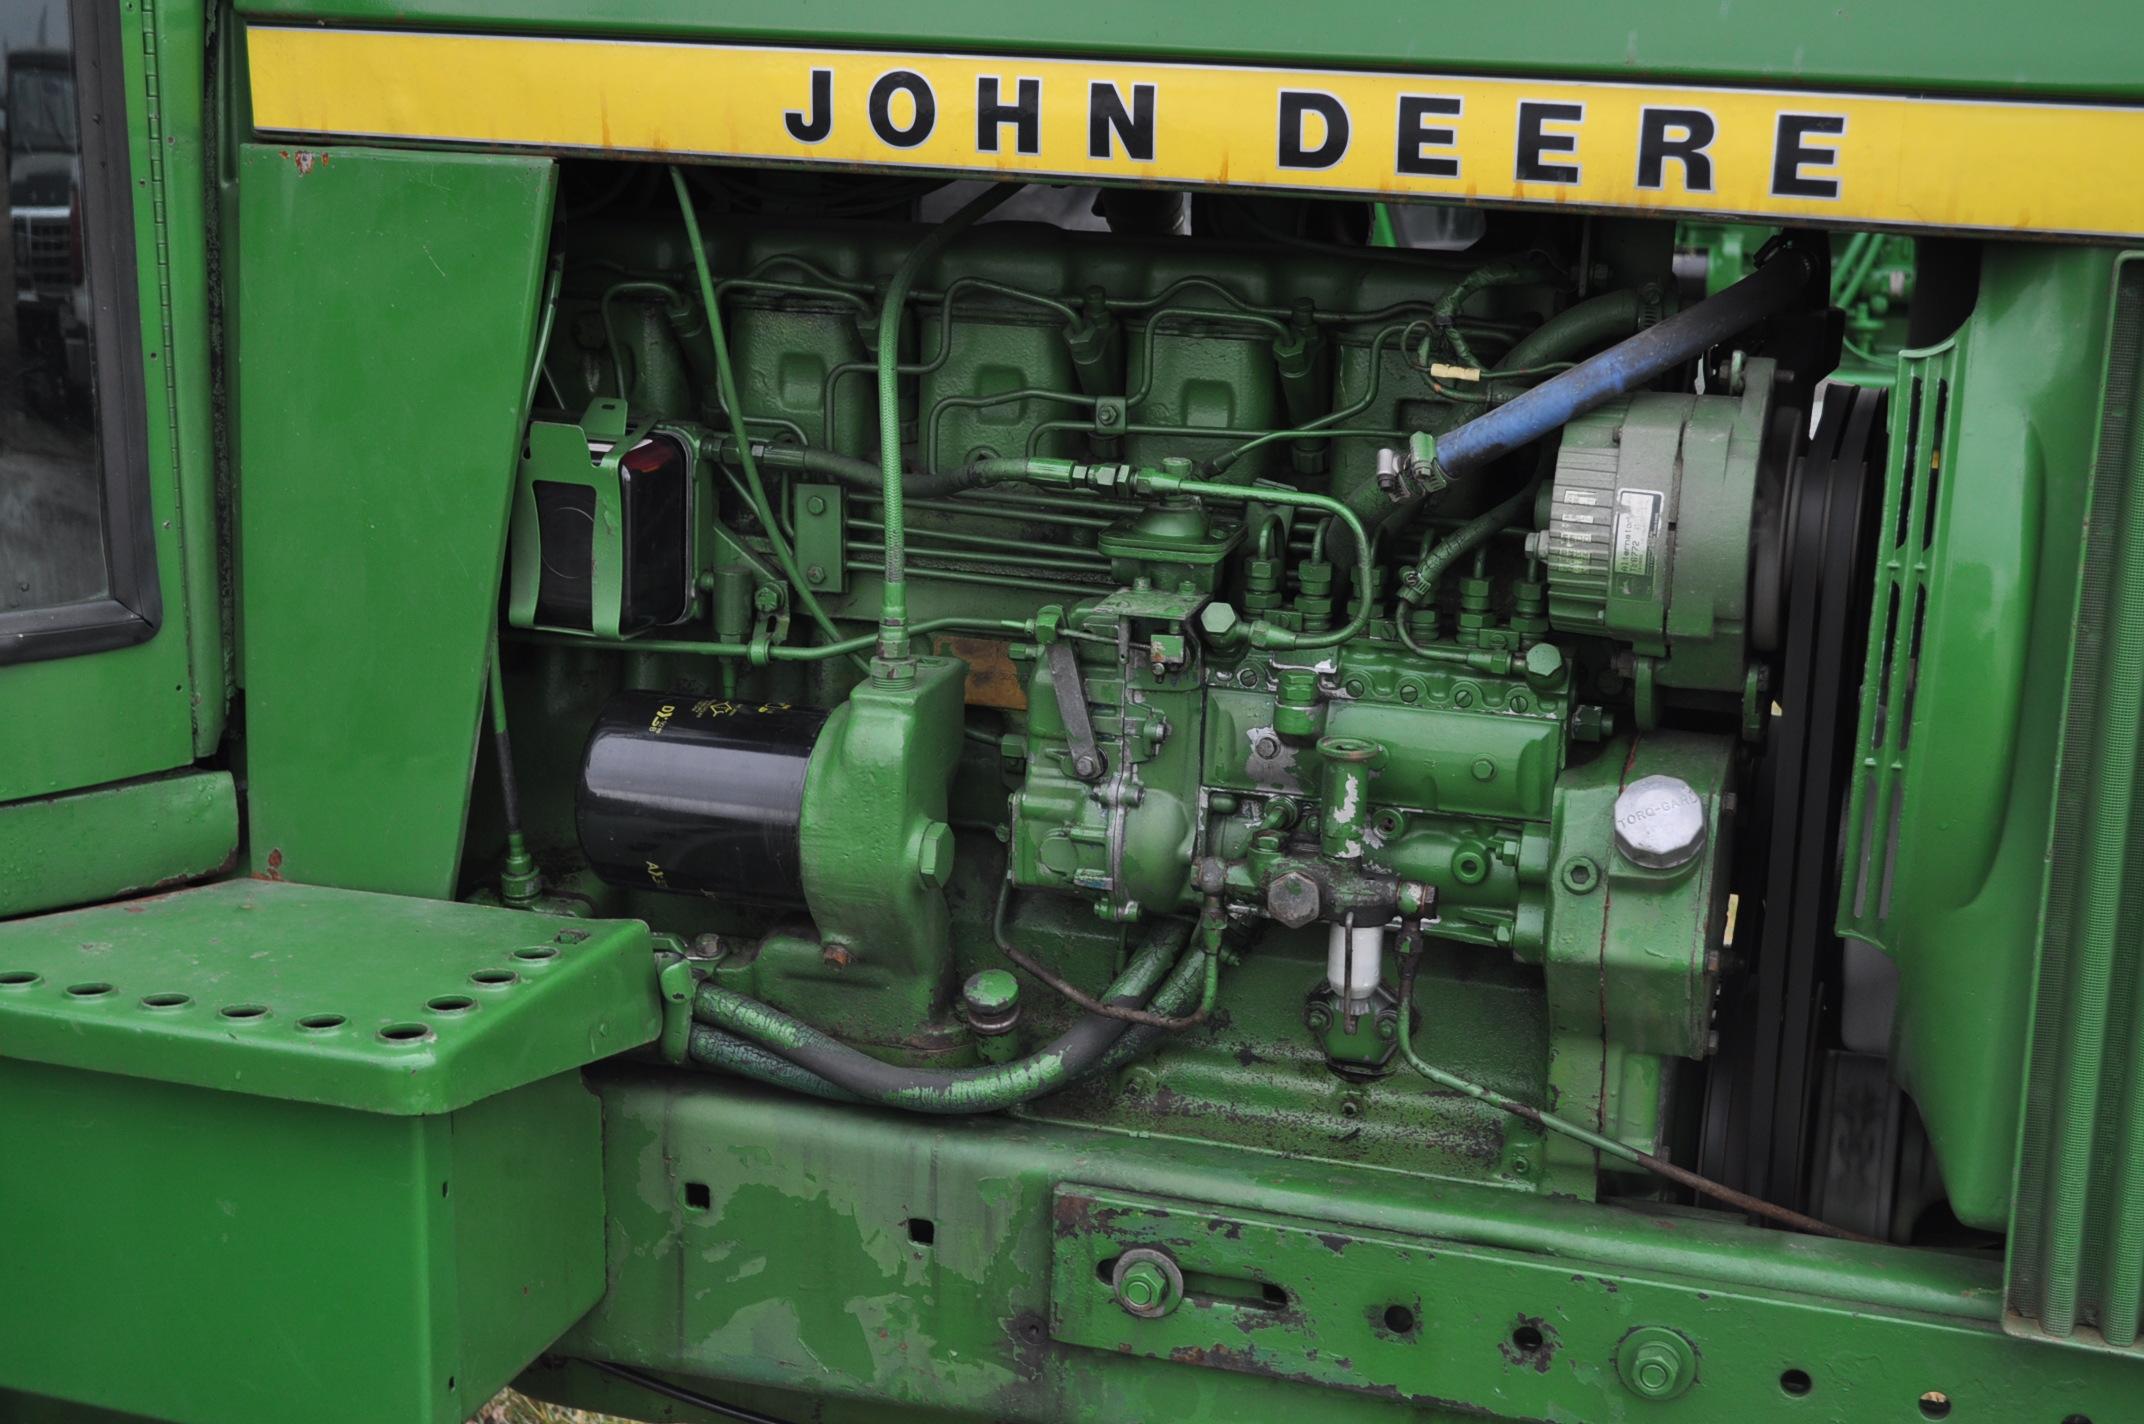 John Deere 4430 tractor, diesel, 18.4-34 hub duals, 10.00-16 front, CHA, Quad range, 2 hyd - Image 9 of 20